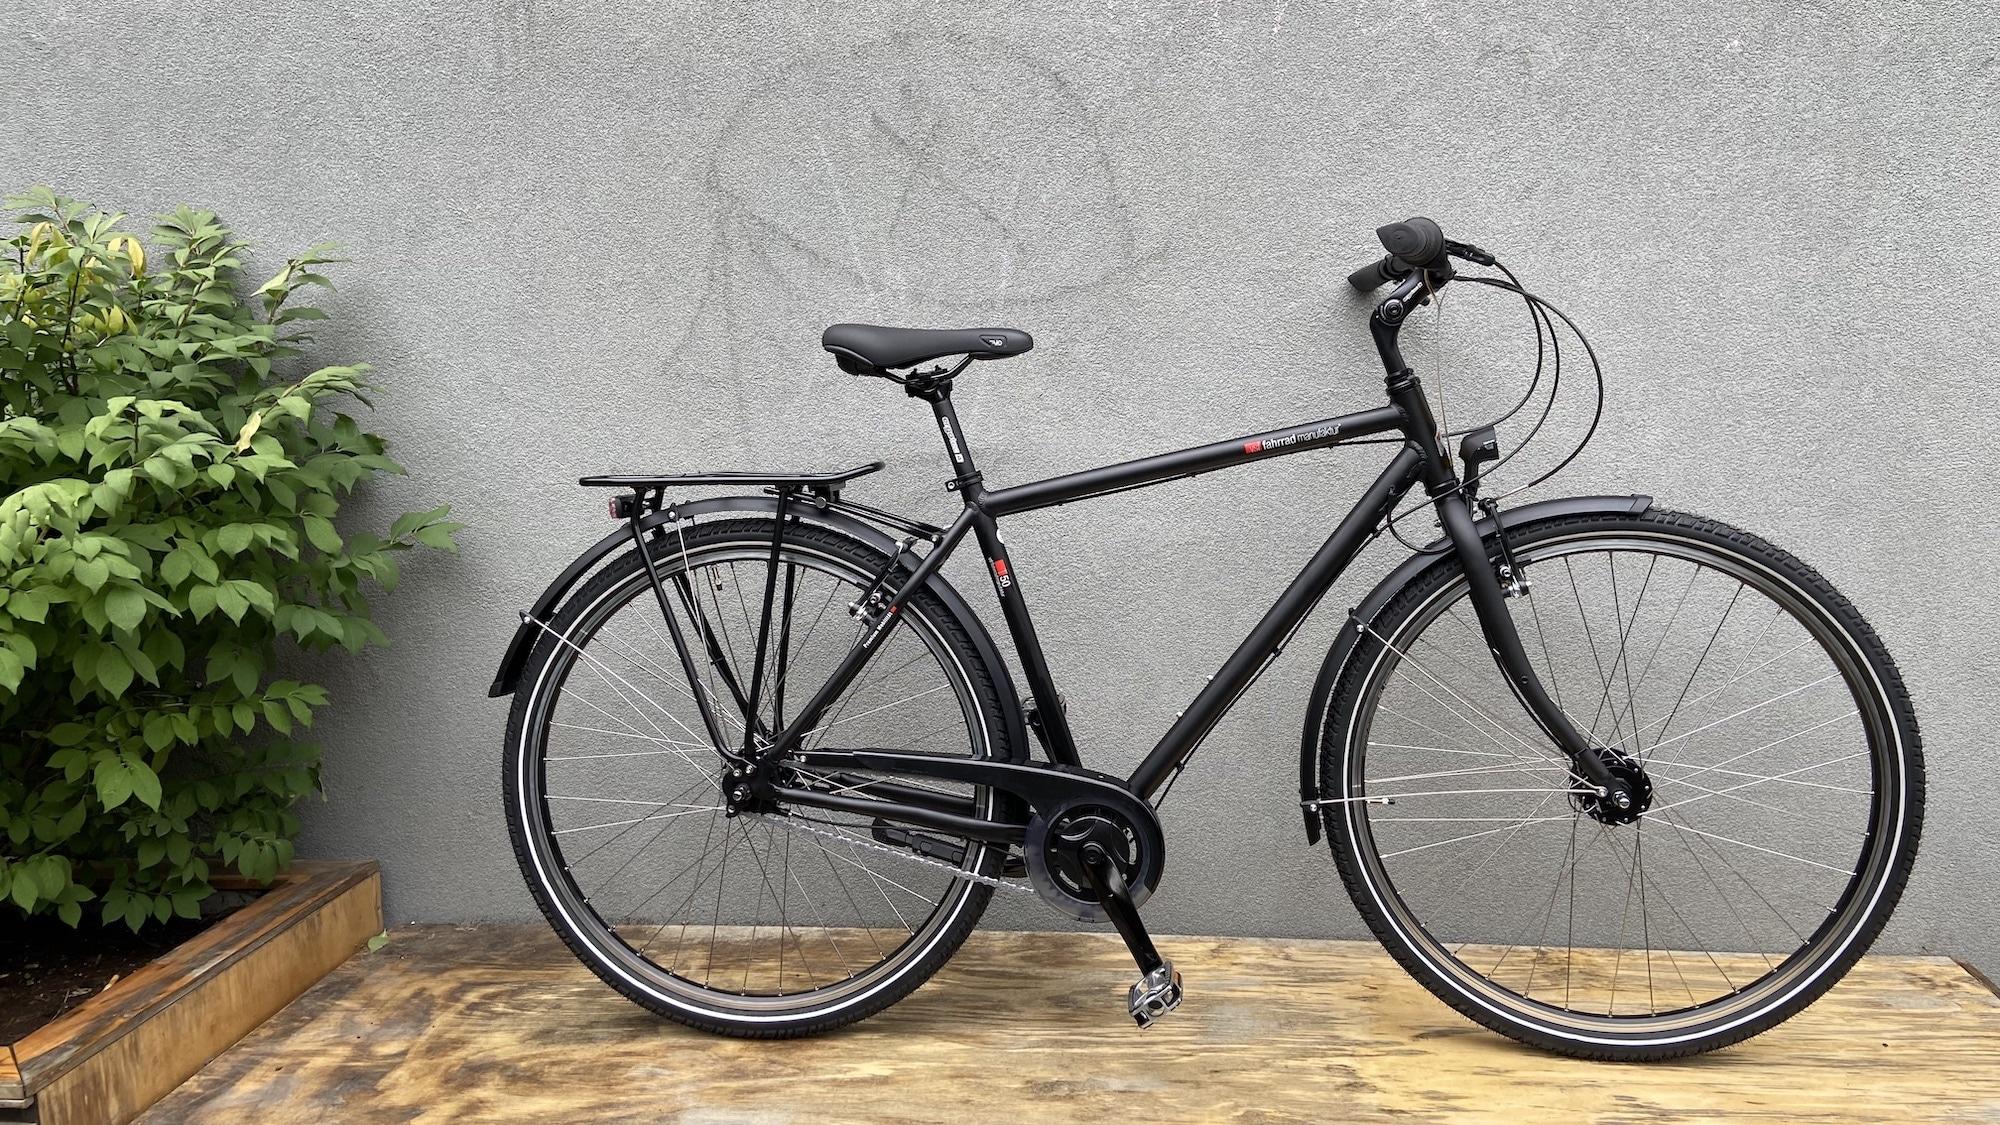 vsf-Fahrradmanufaktur_t-50-1